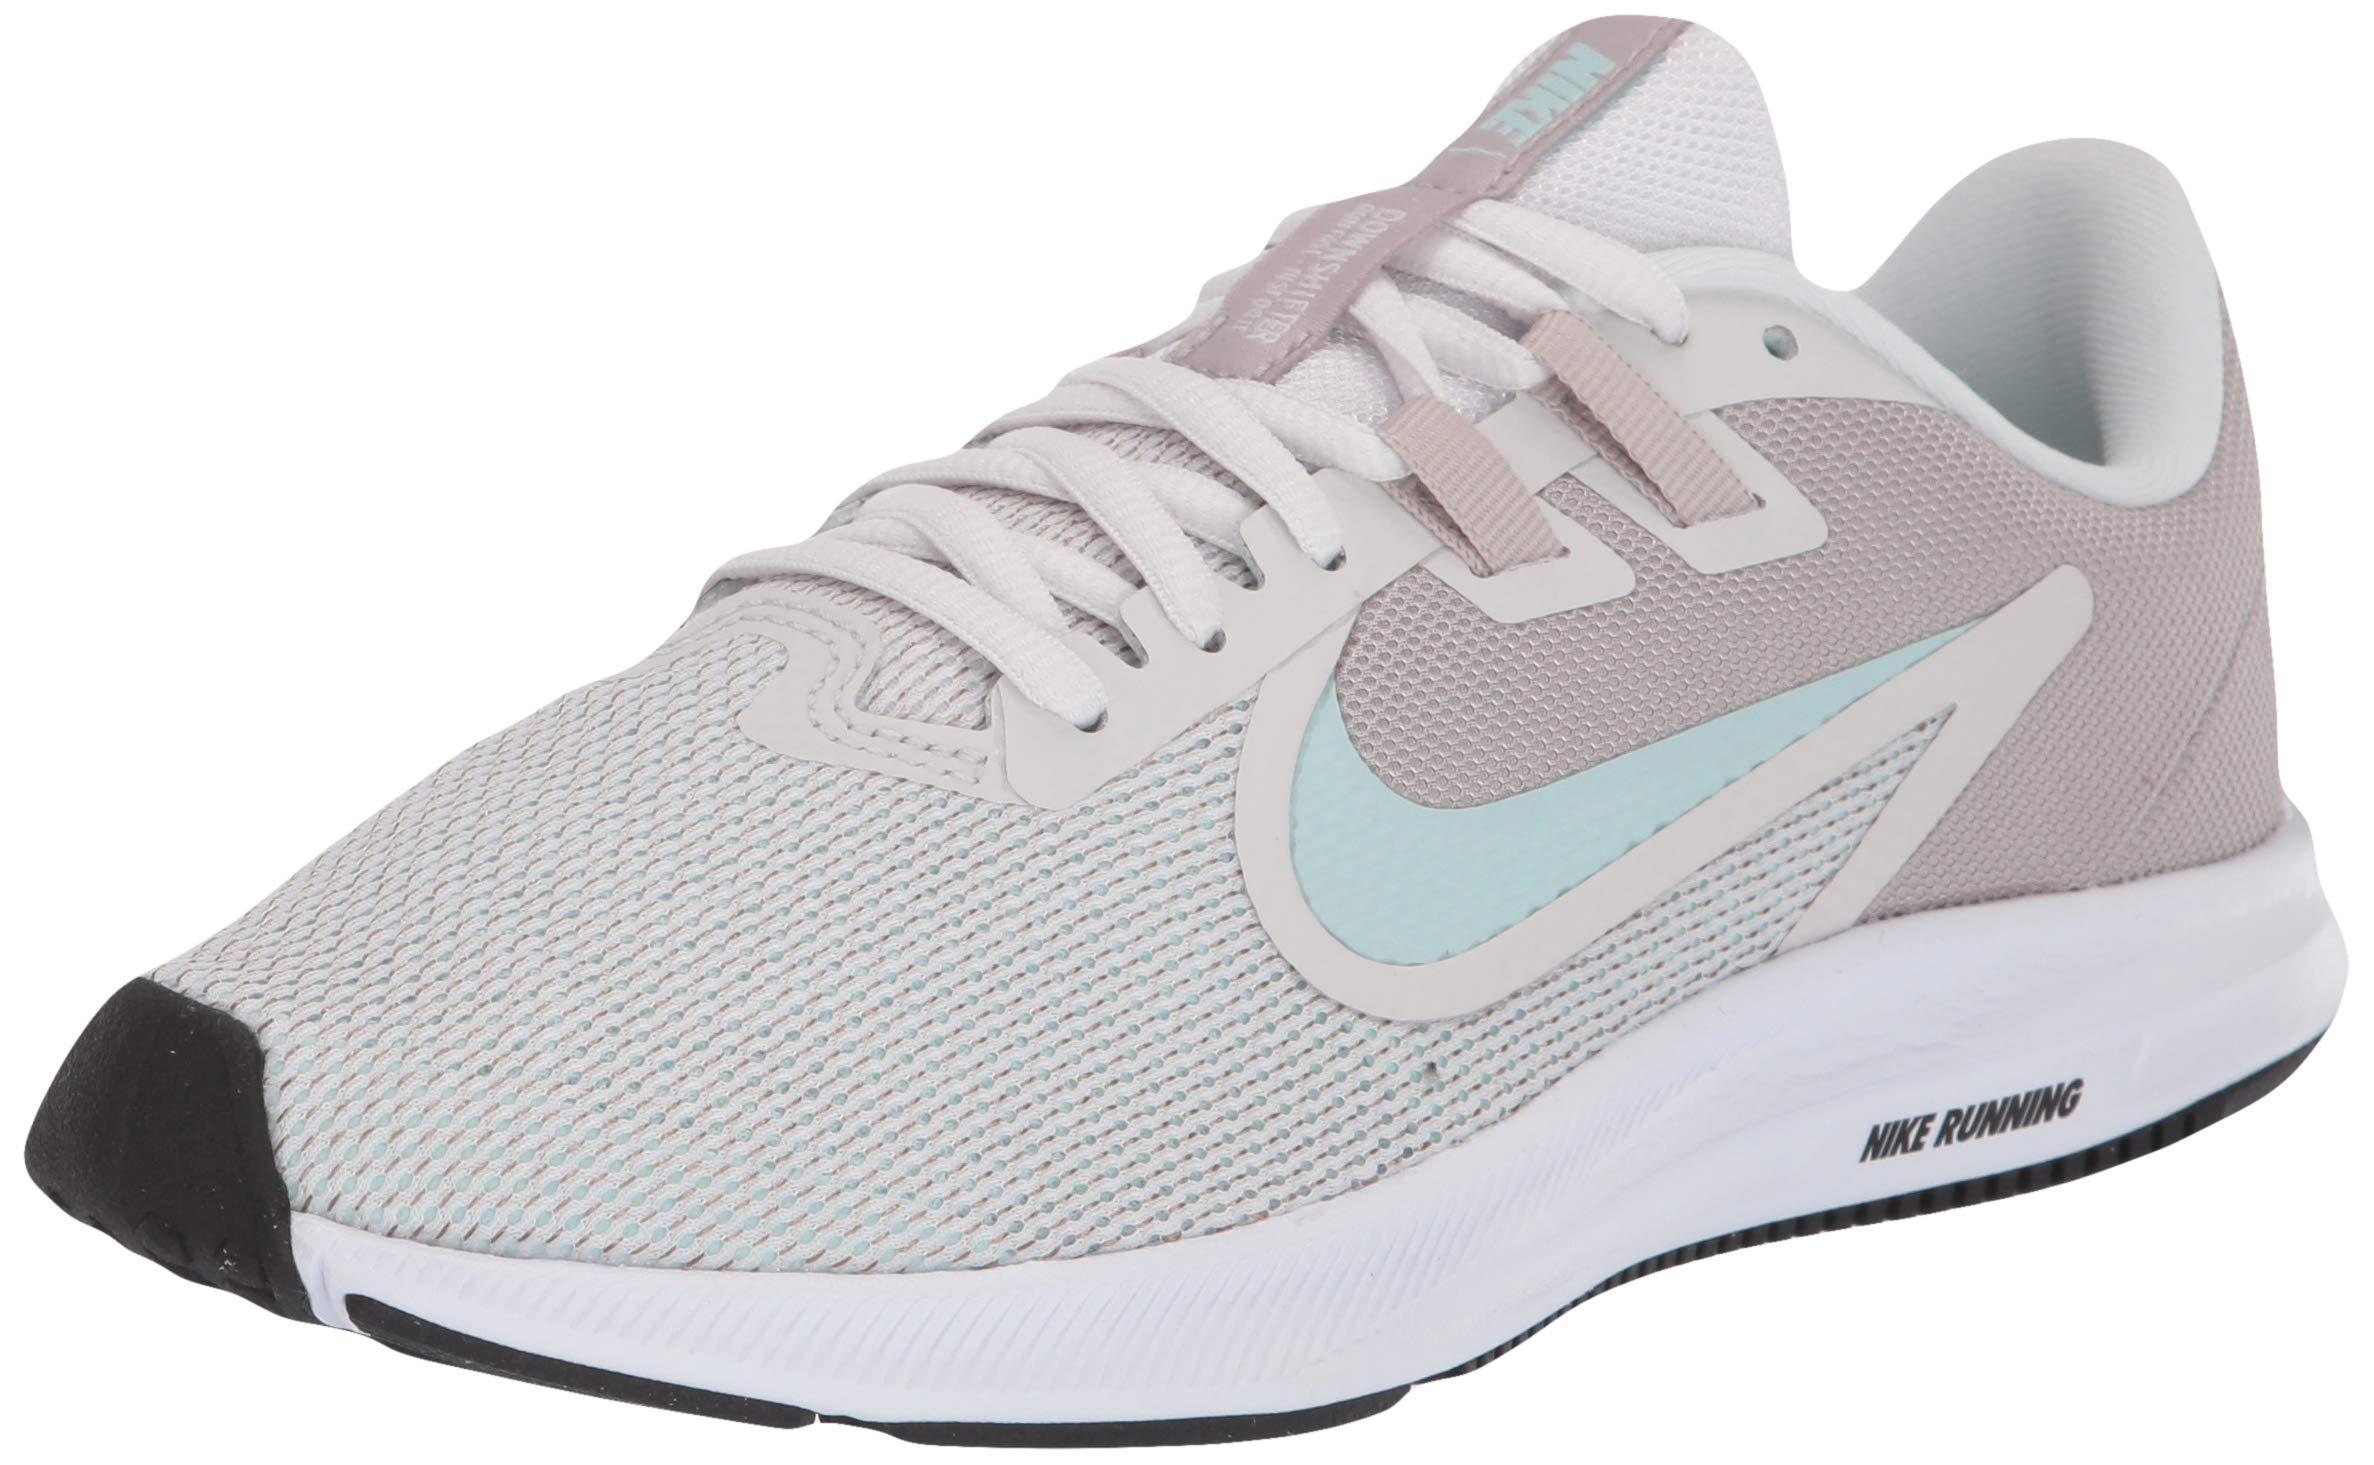 a46b989e0295c Nike Women's Downshifter 9 Sneaker, Platinum Teal Tint-Moon Particle, 8  Regular US